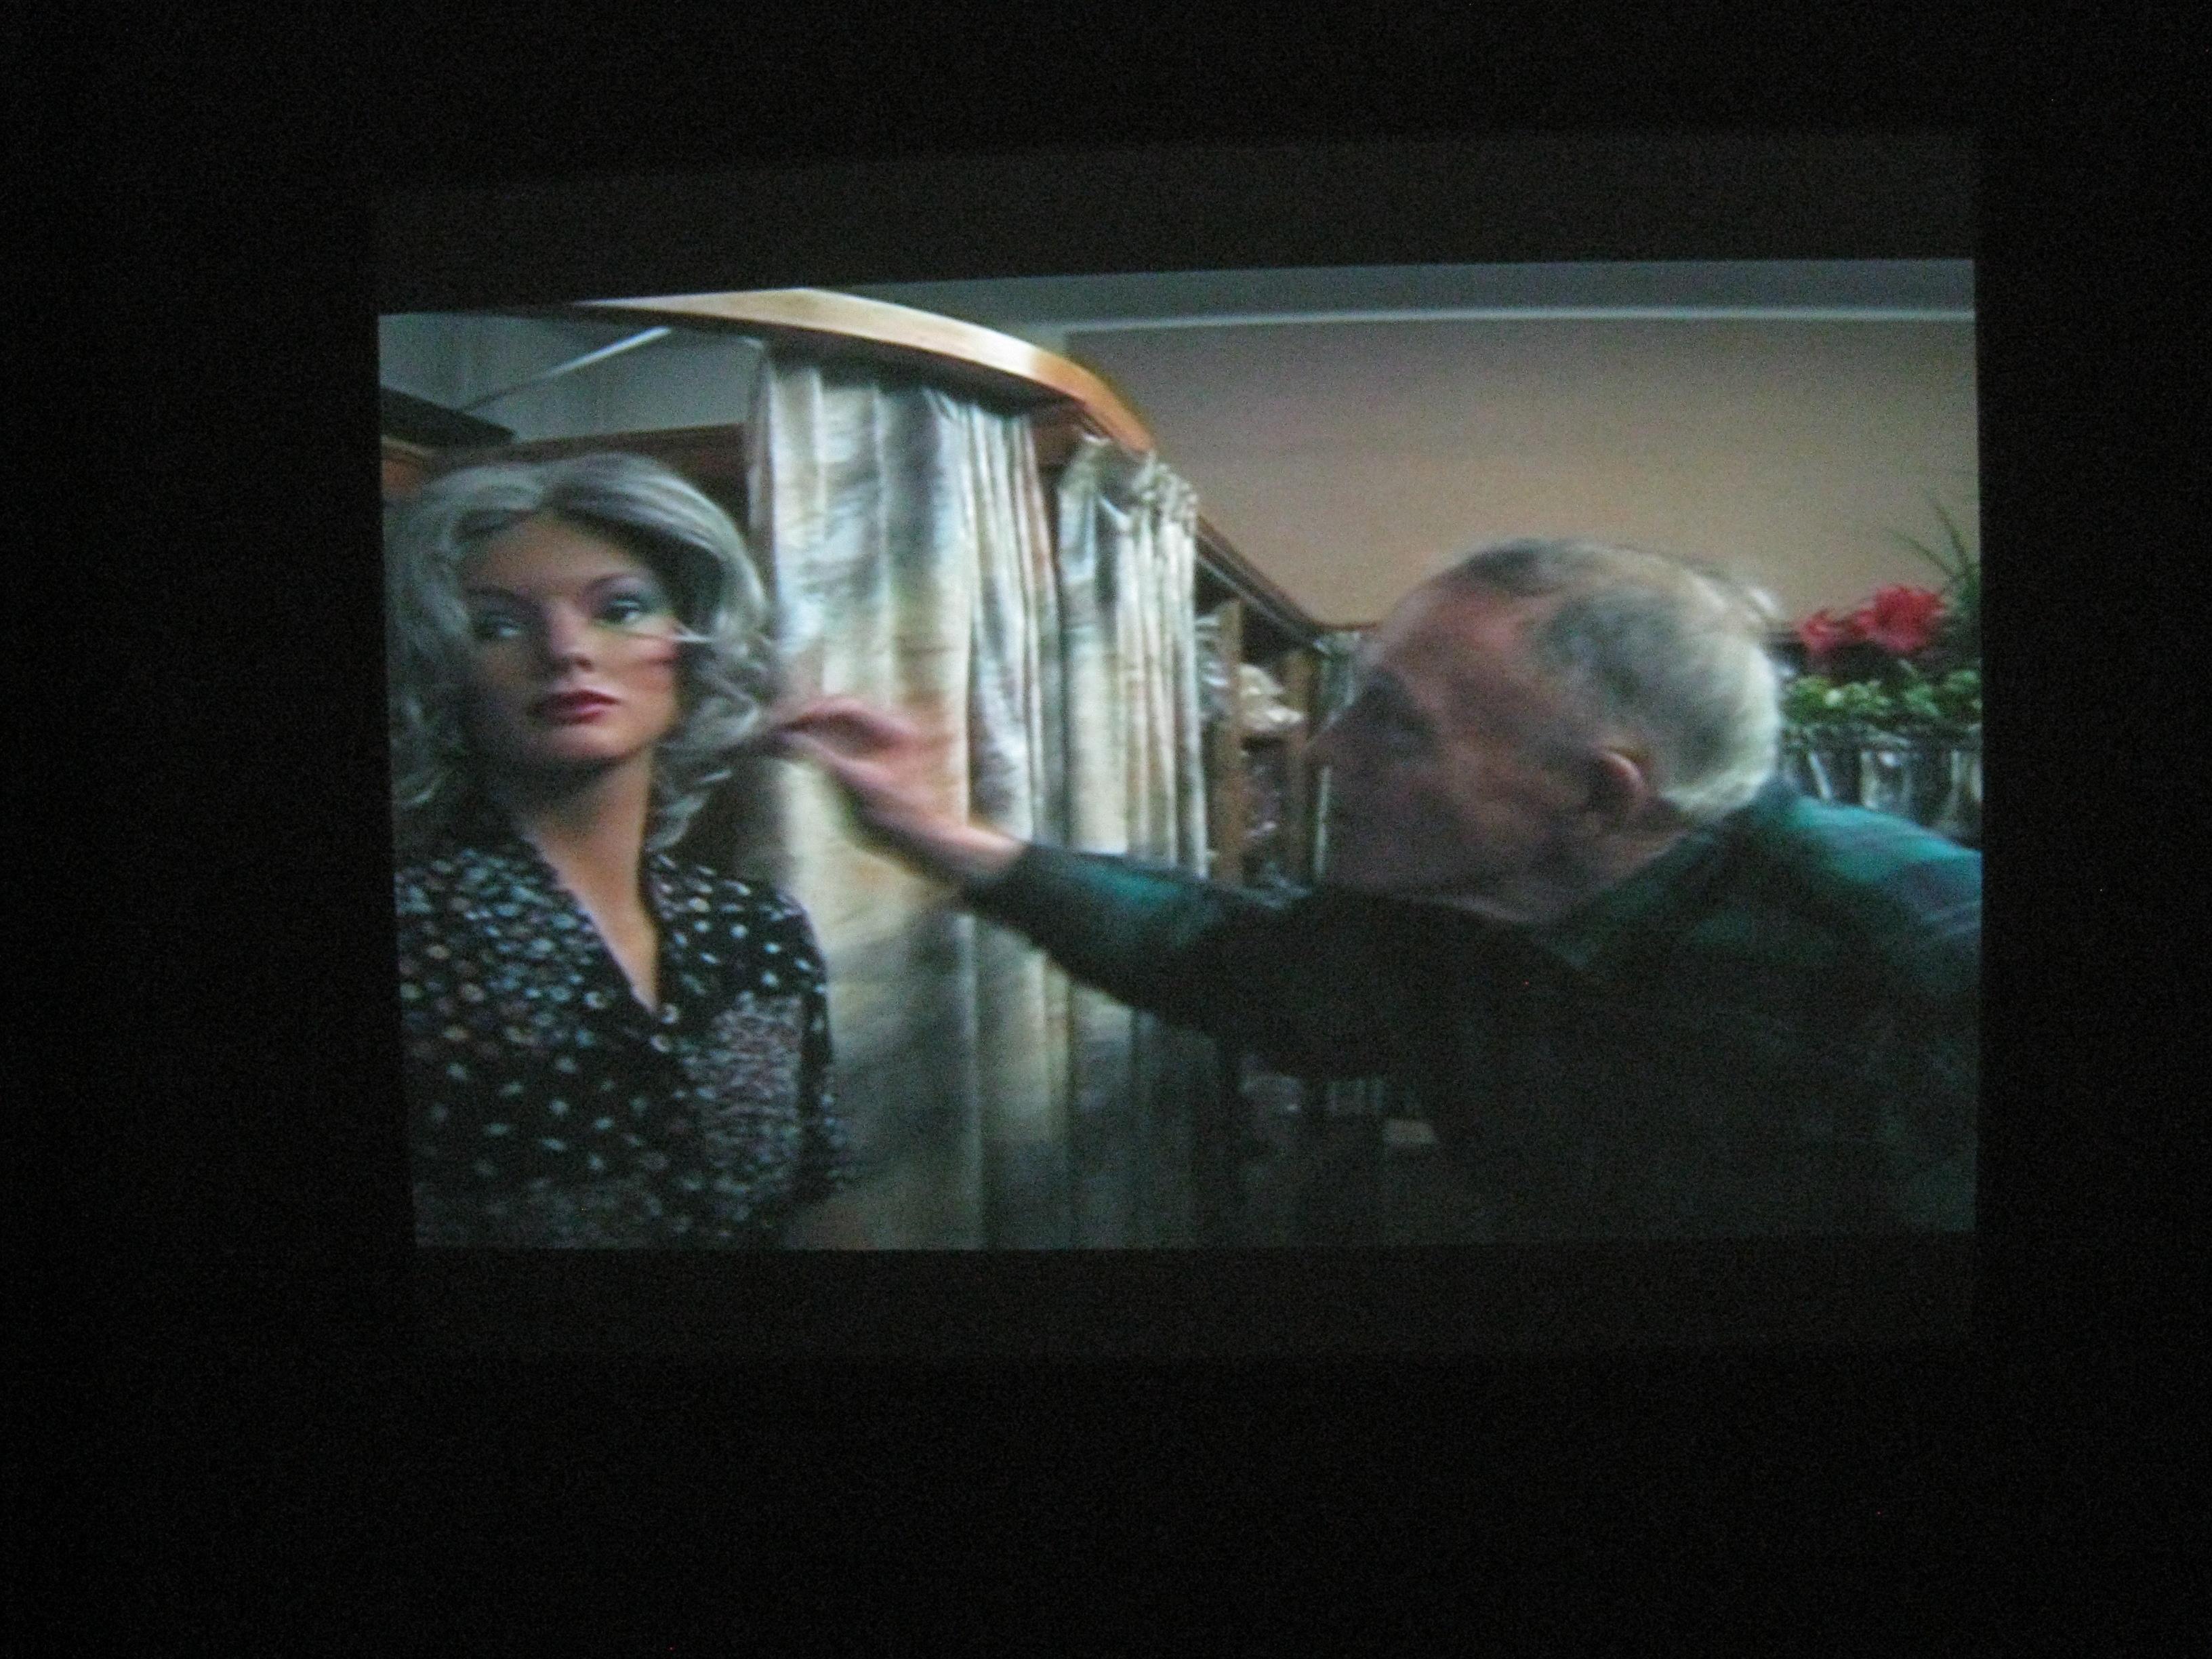 Still photo from video